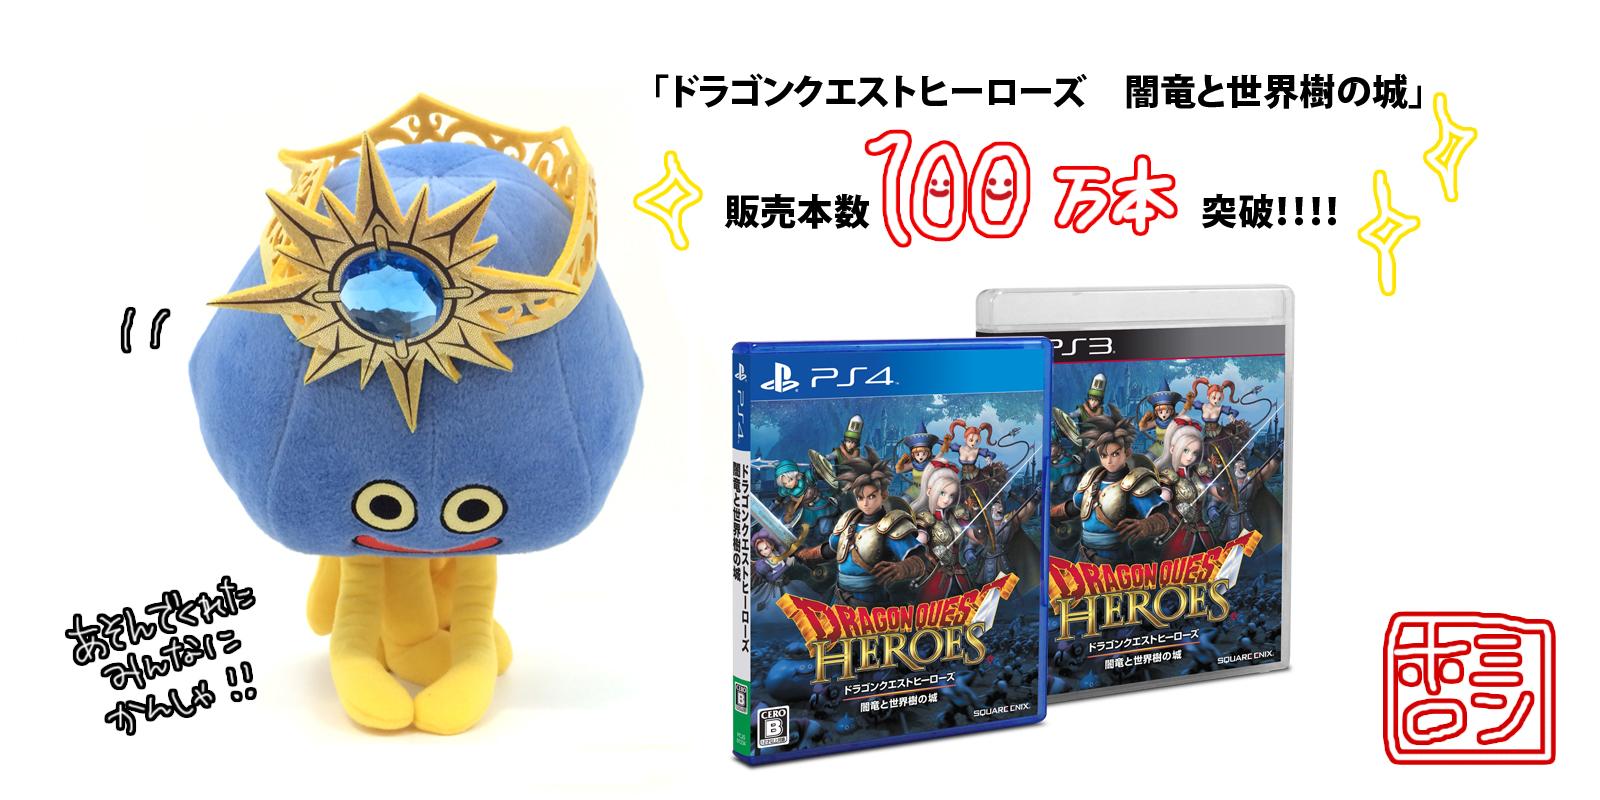 http://blog.jp.square-enix.com/heroes/IMG_7760.jpg